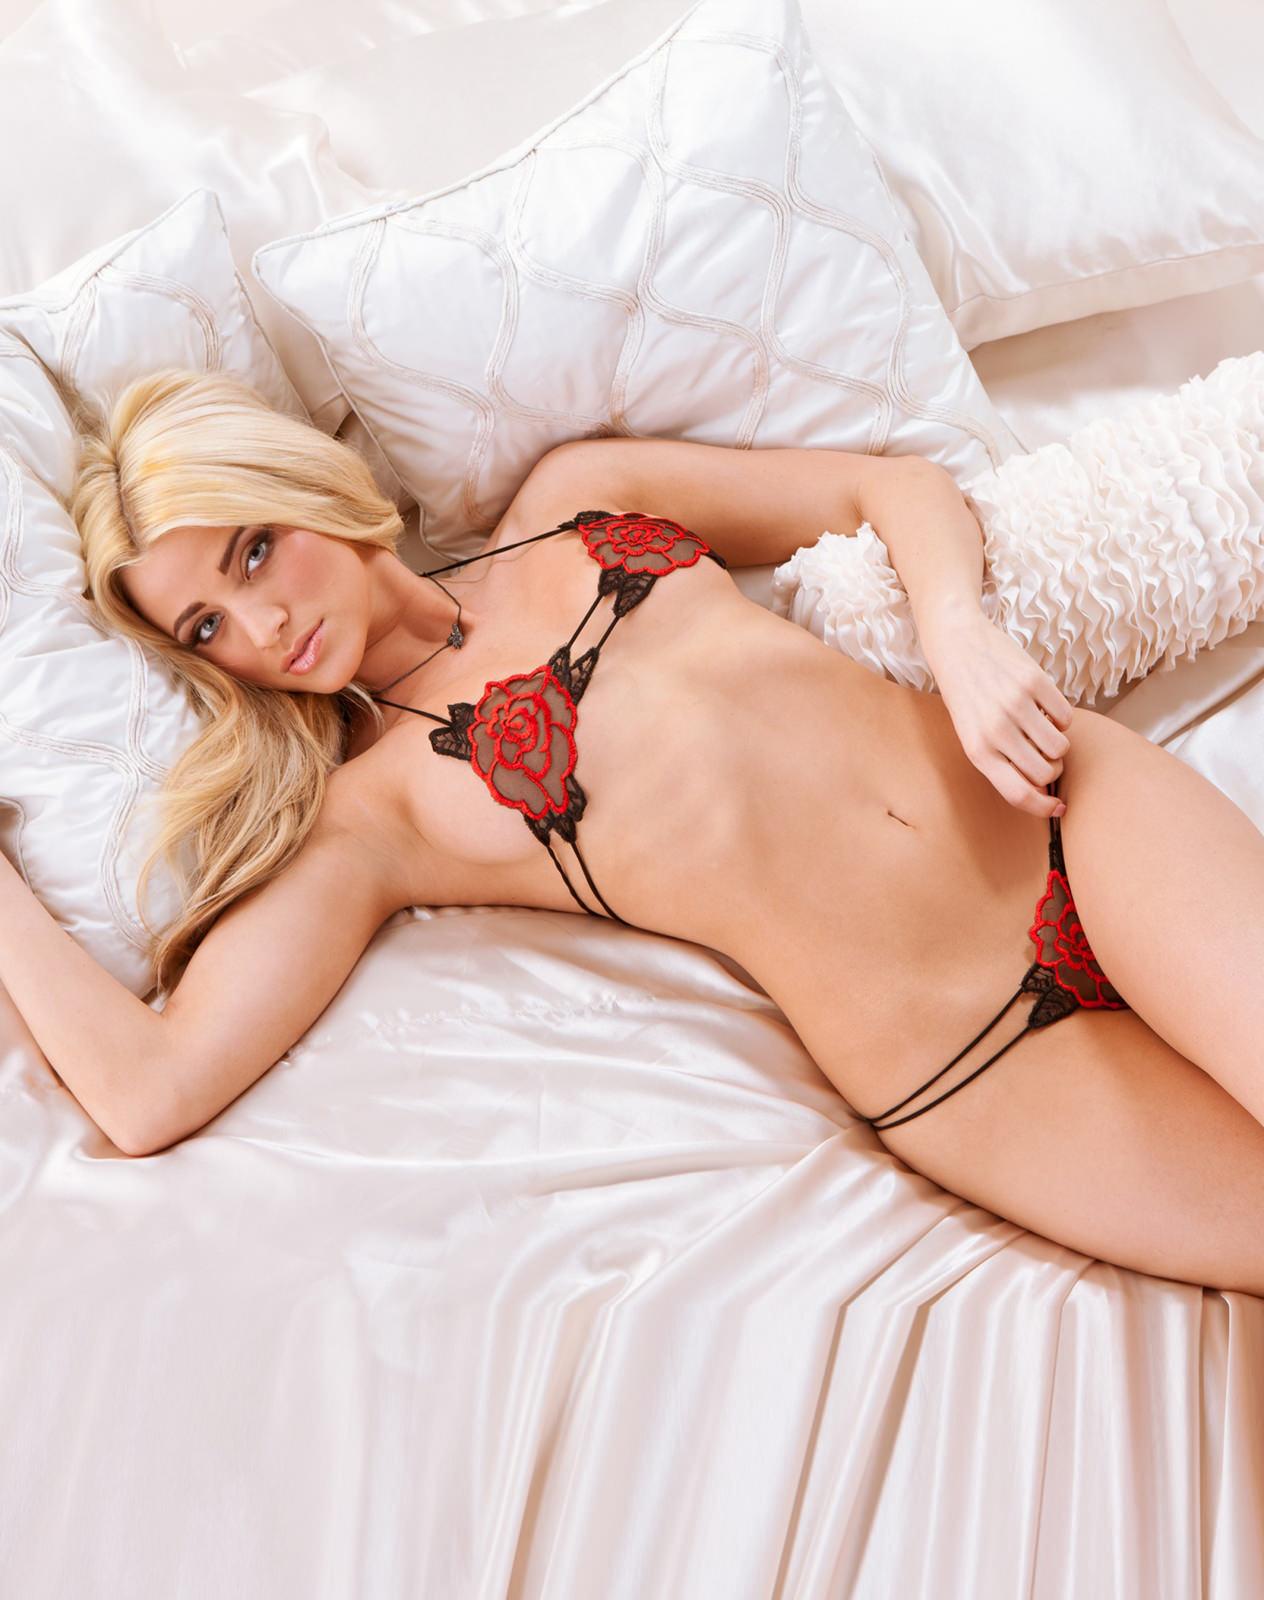 Olivia Paige Photo Gallery